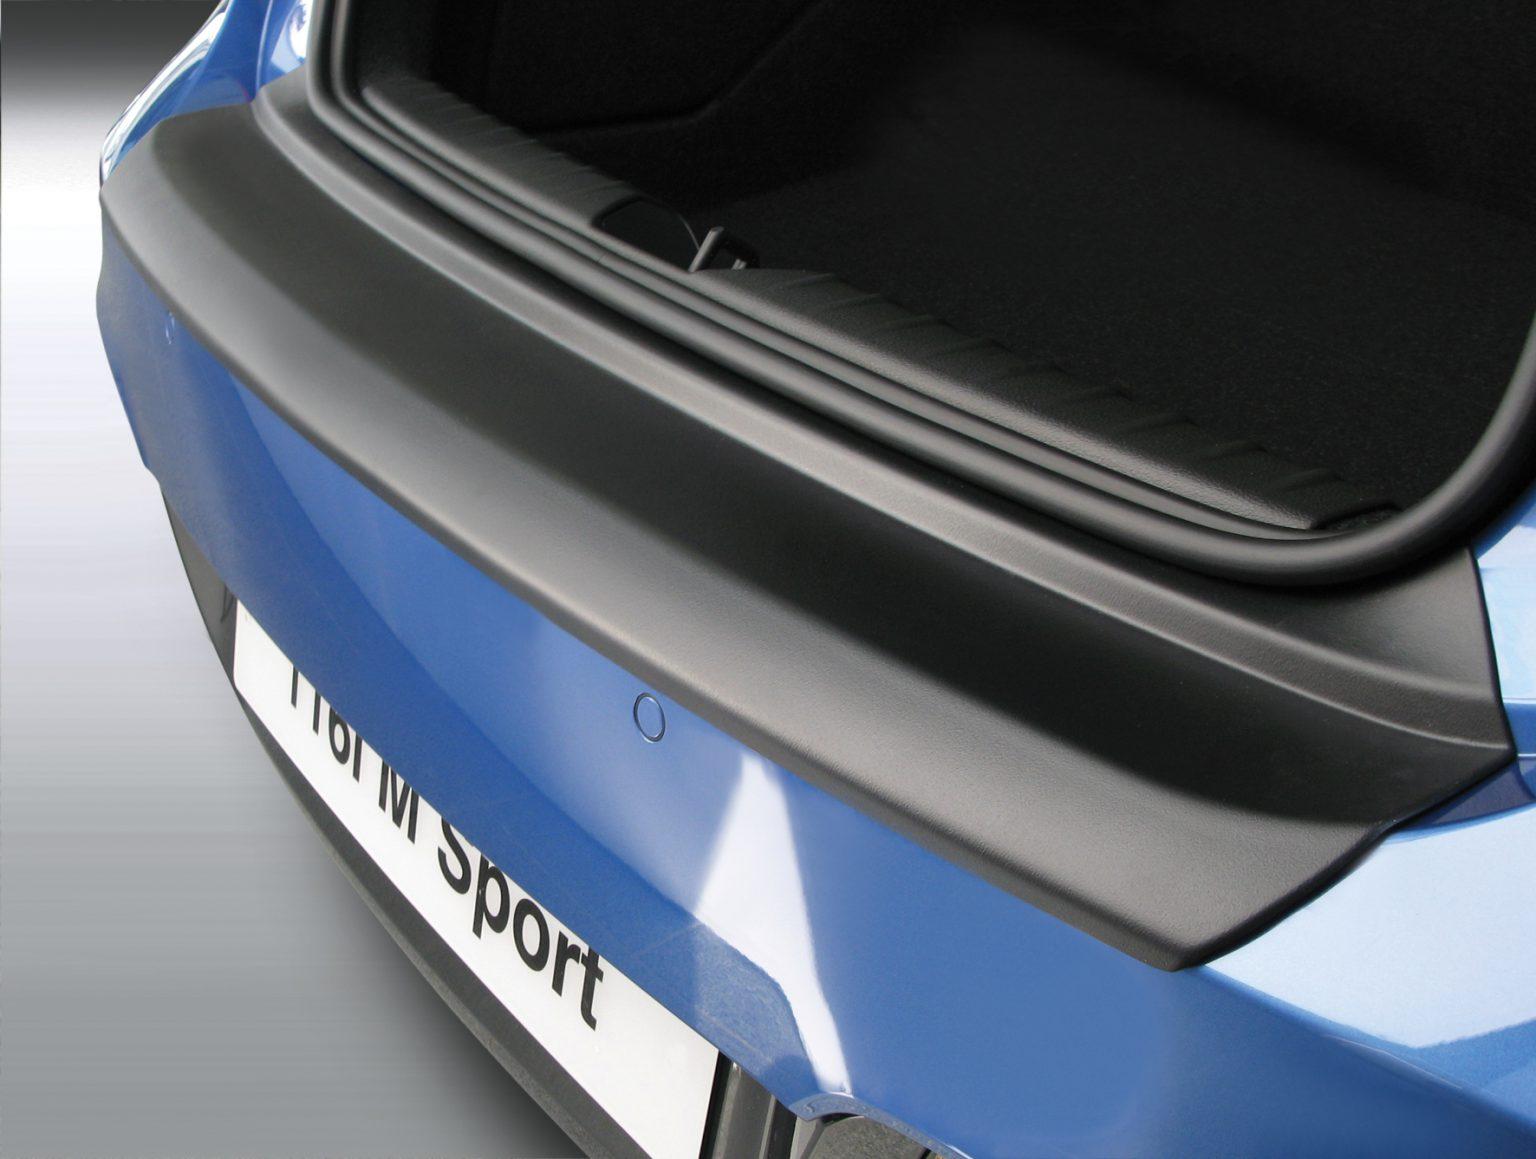 Ladekantenschutz BMW 1er 3-/5-Türer M SPORT - ABS ...